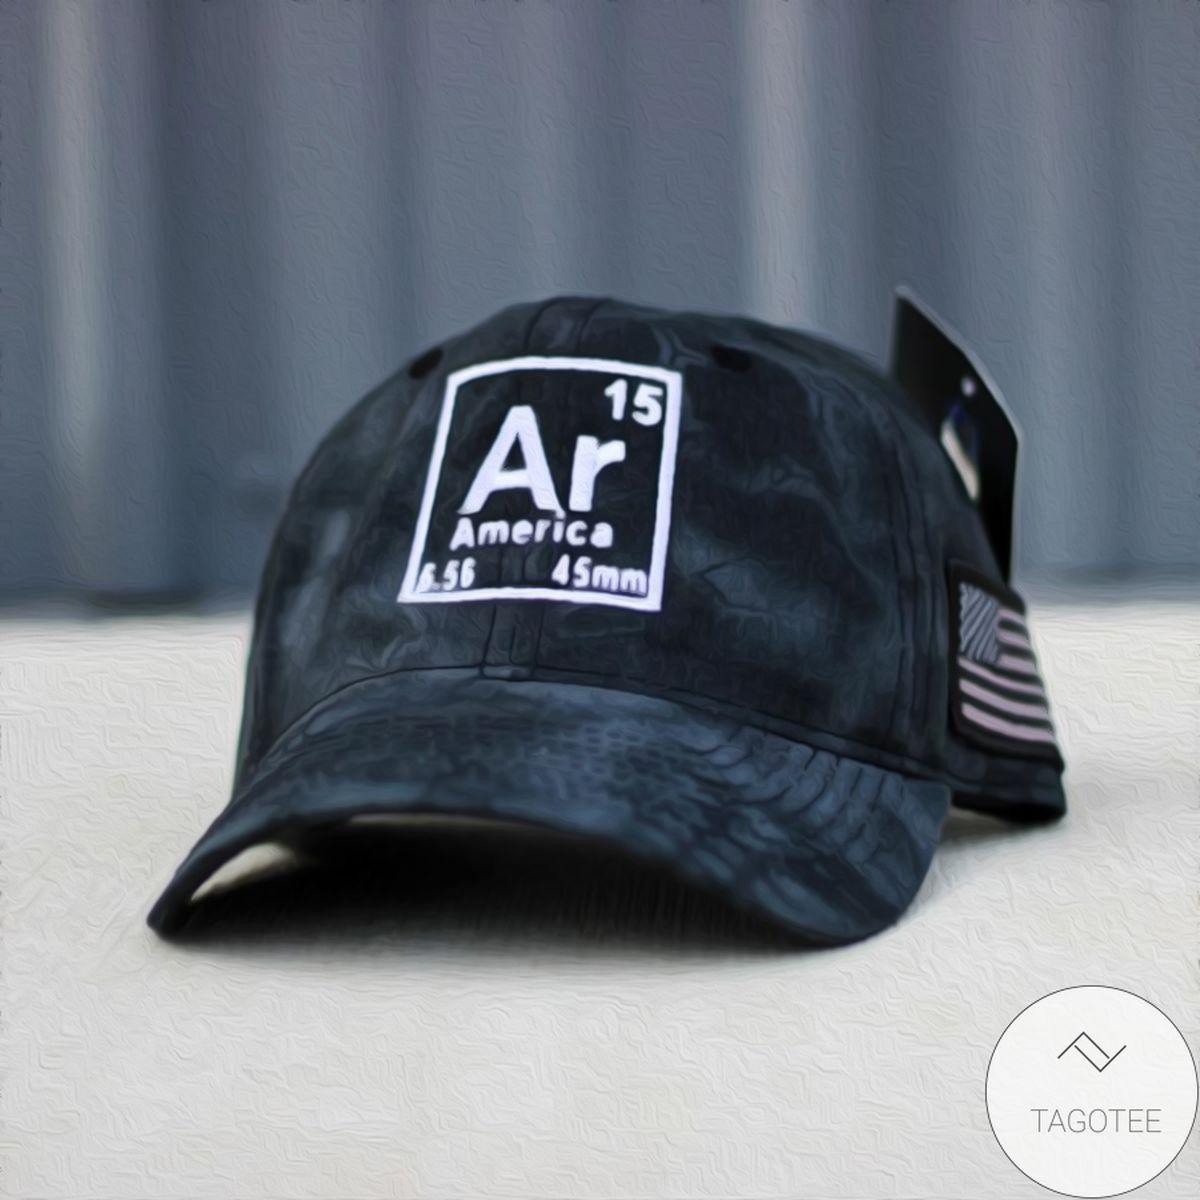 Ar 15 America Cap